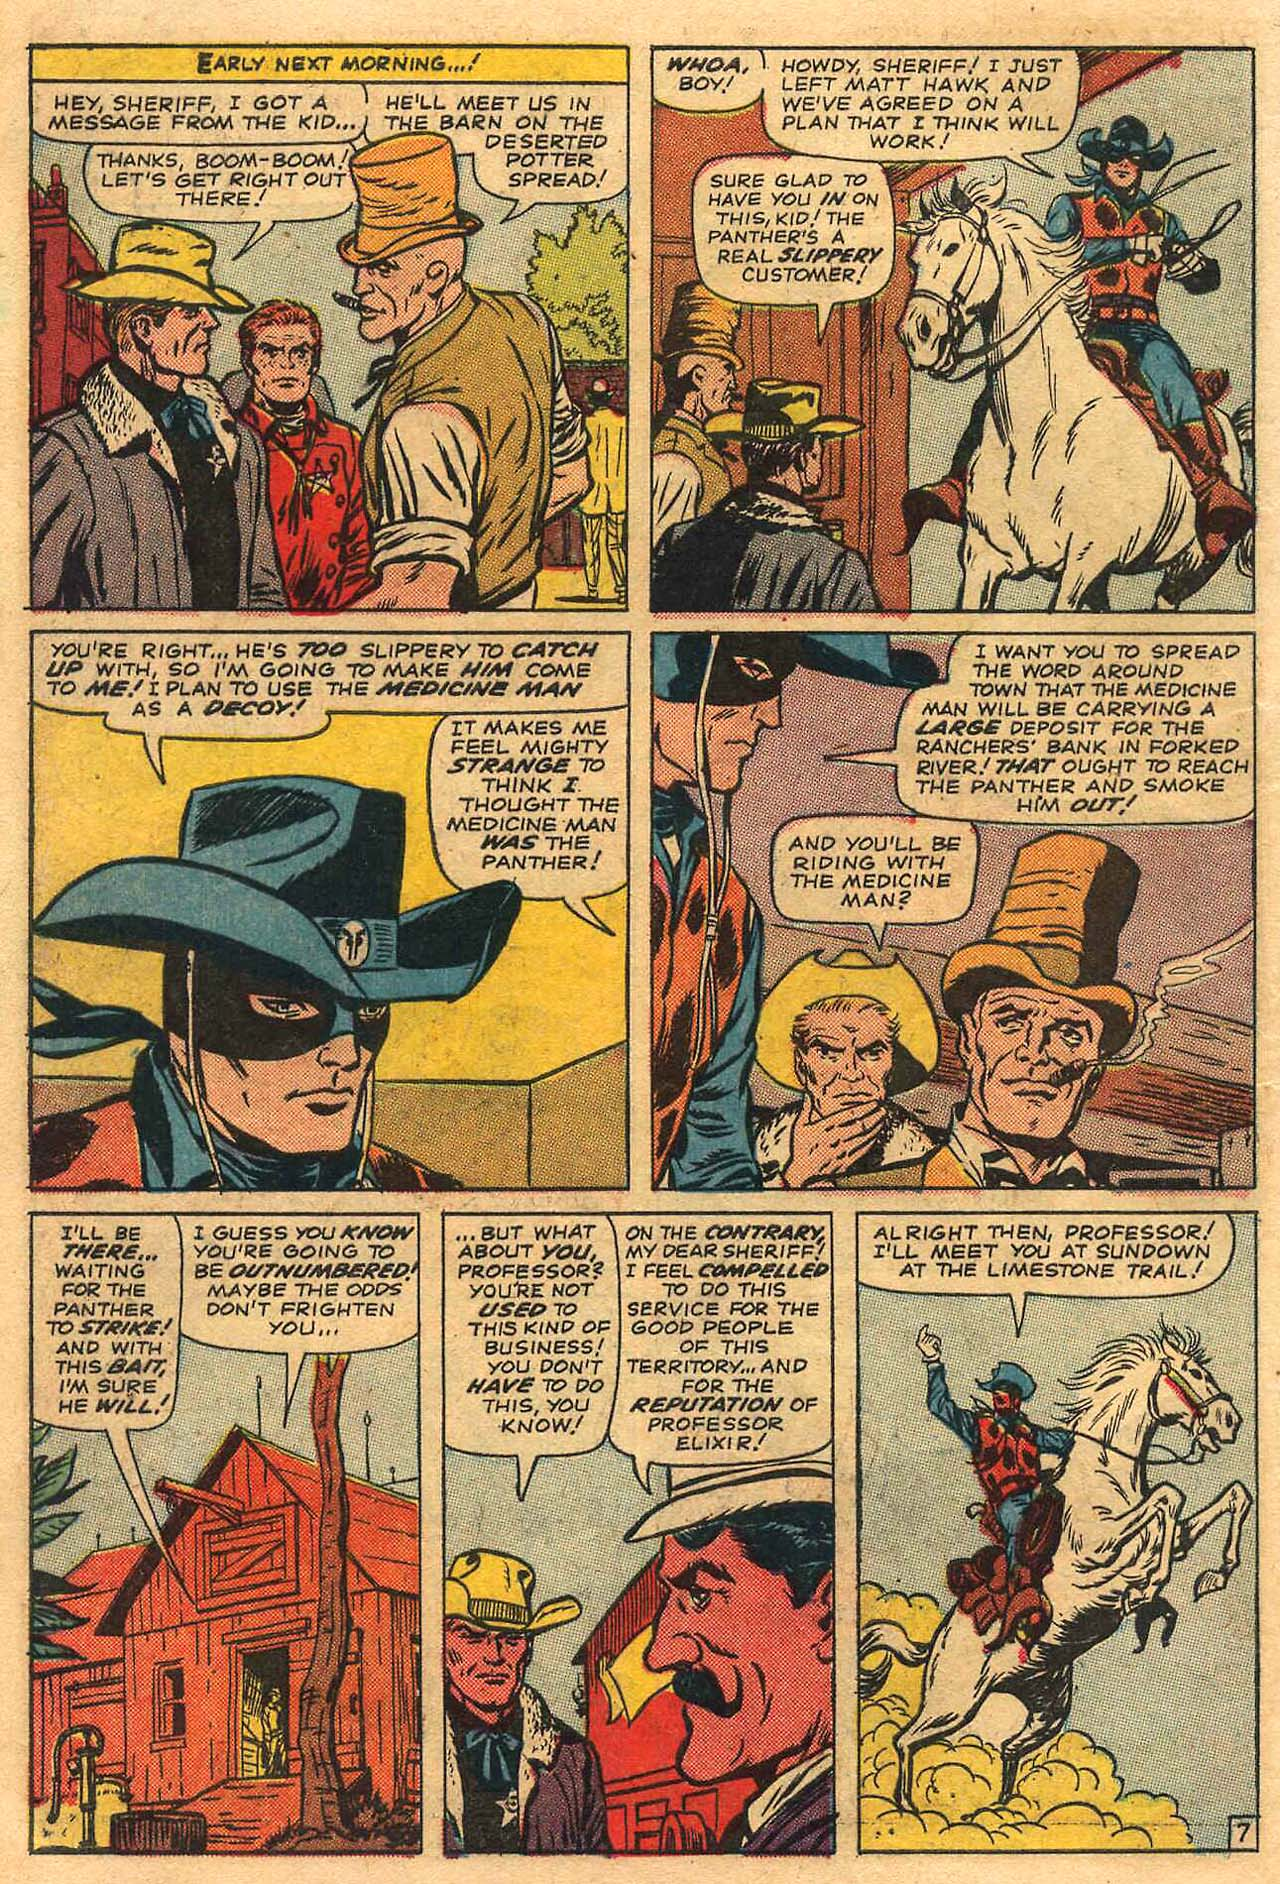 Read online Two-Gun Kid comic -  Issue #77 - 10